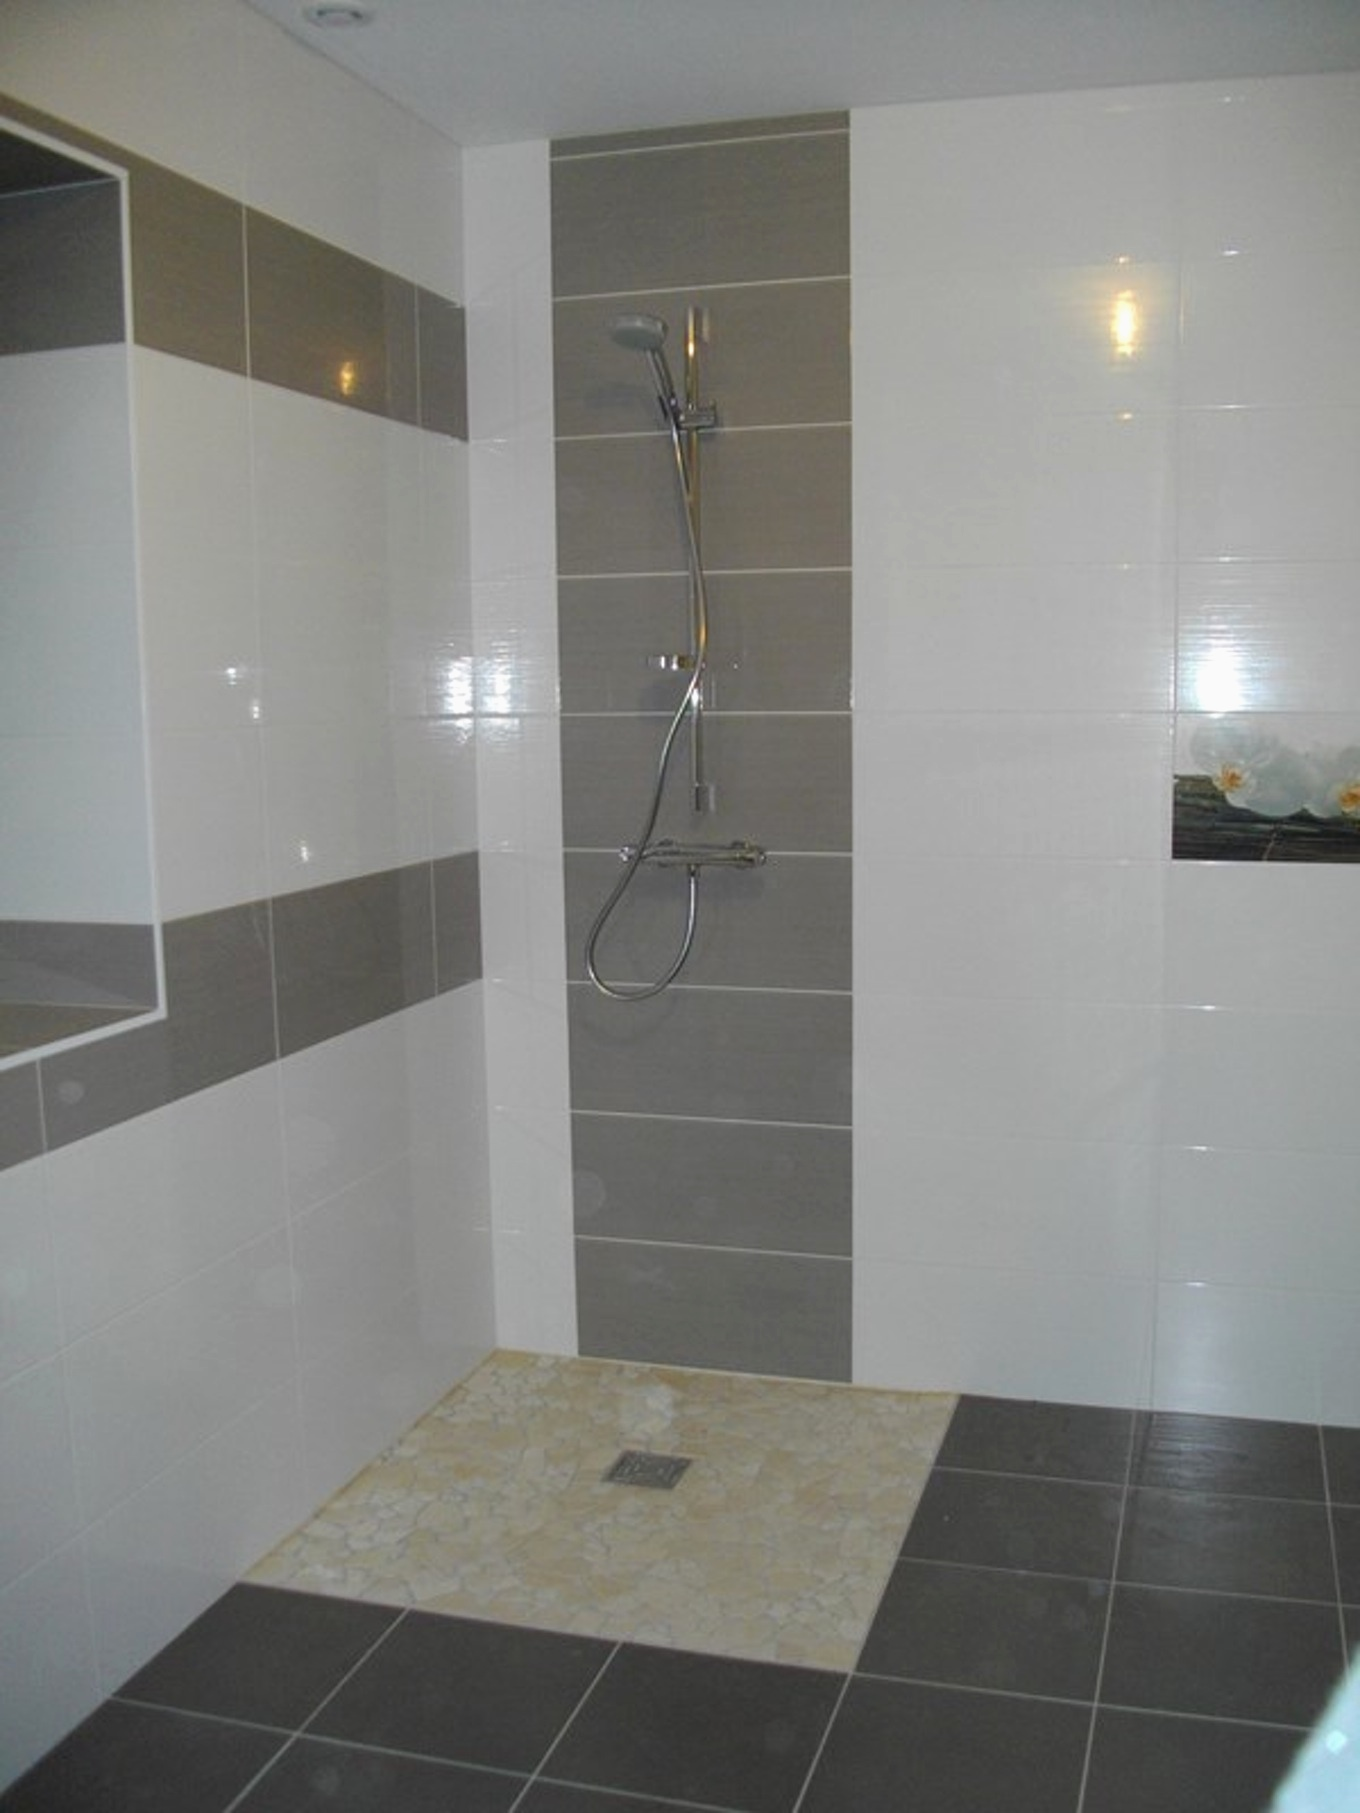 Carrelage blanc salle de bain castorama - livraison-clenbuterol.fr